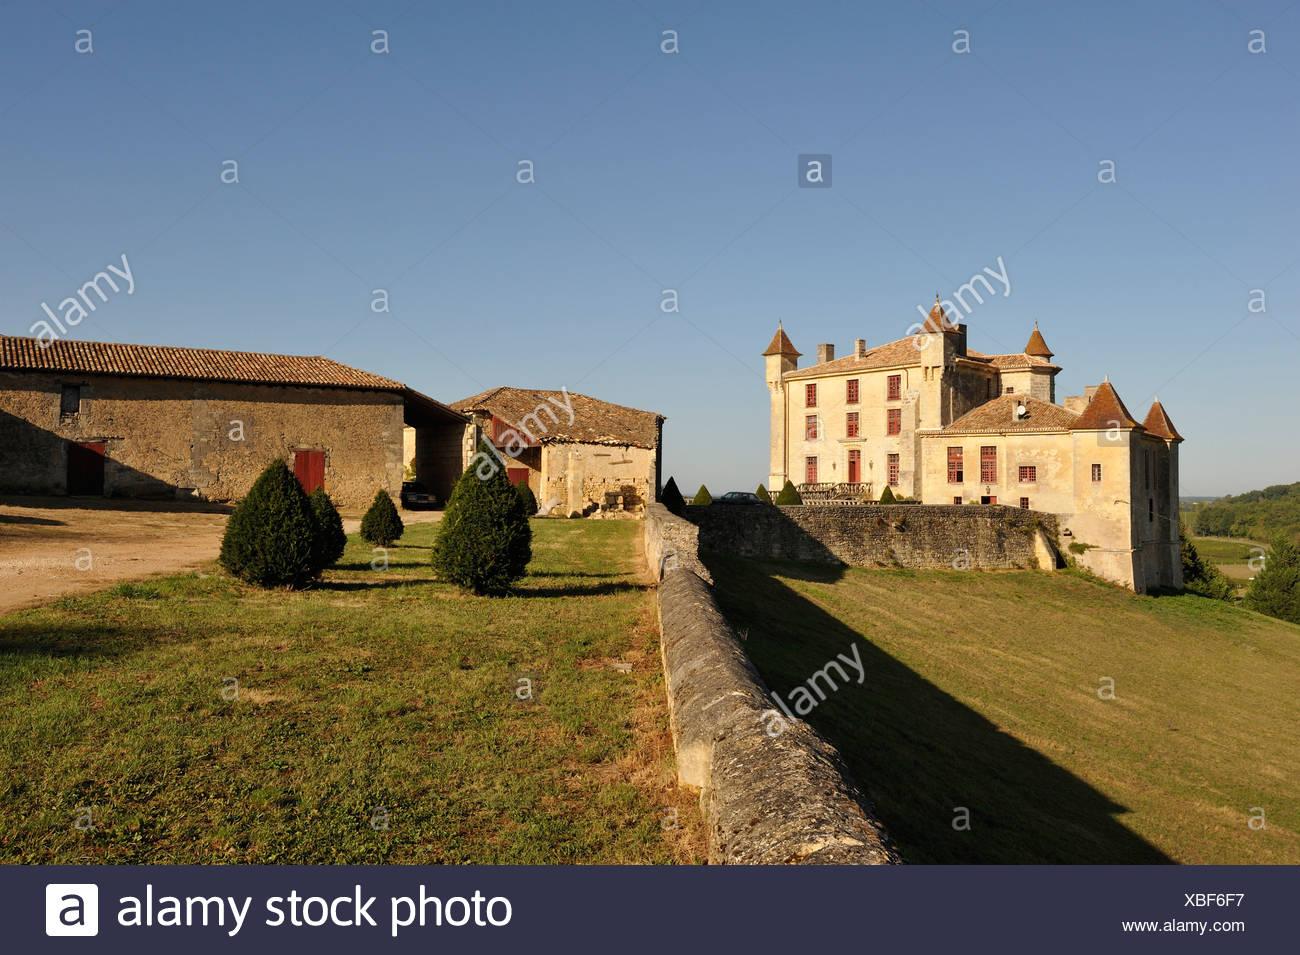 the feudal Castle of Monbadon, Monbadon-Puisseguin, Gironde department, Aquitaine region, south-western France, Europe - Stock Image